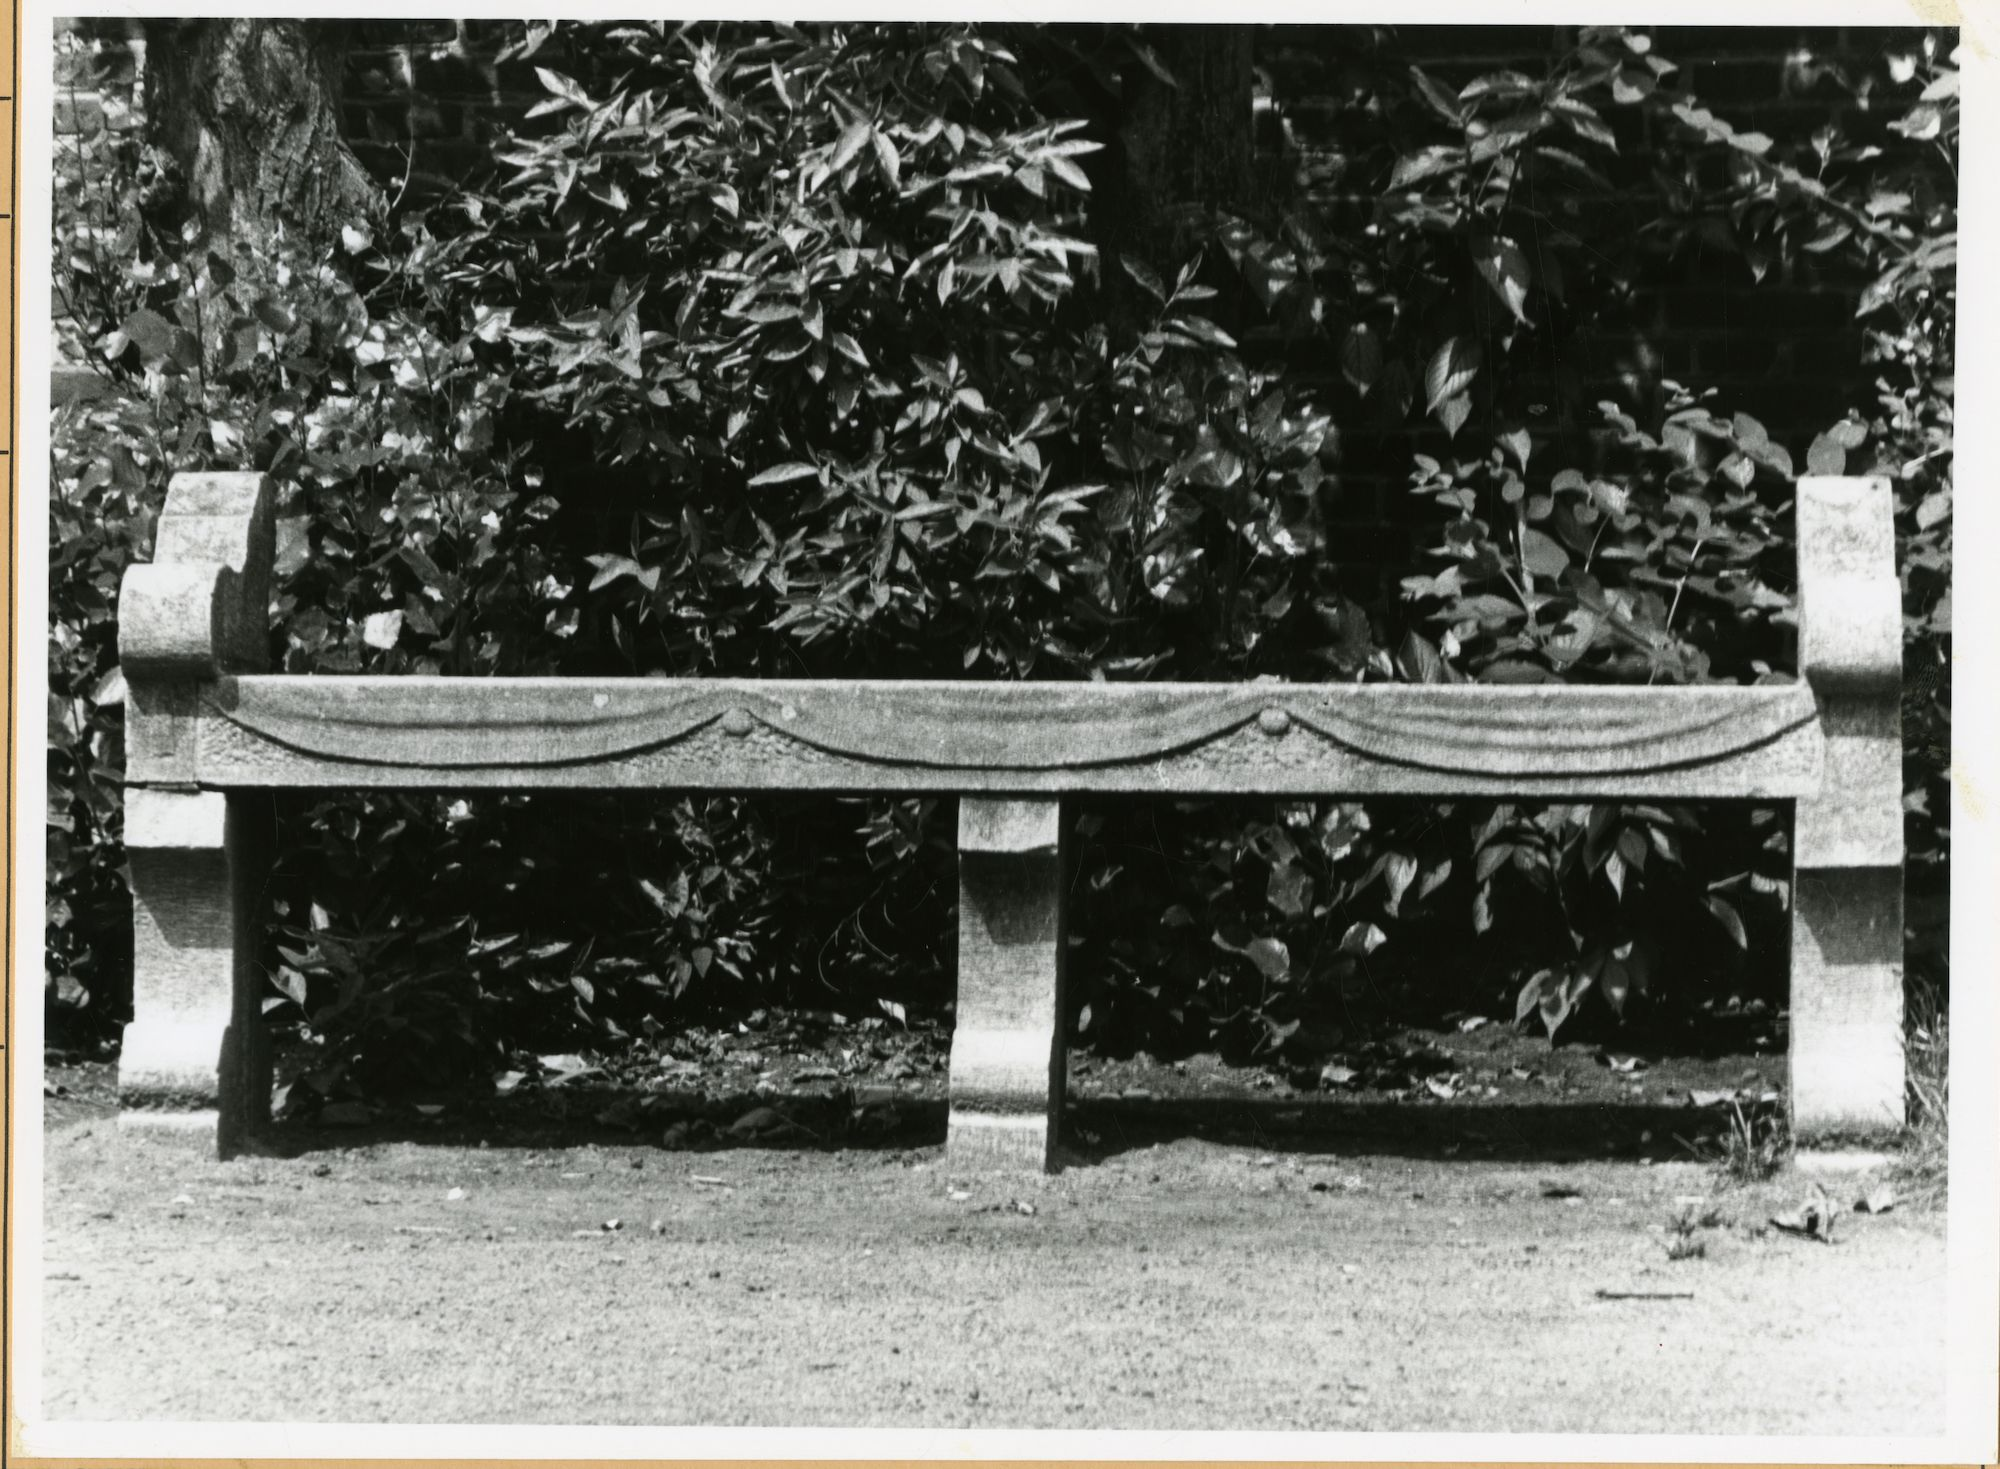 Gent: Godshuizenlaan: Bijlokehof: zitbank, 1979